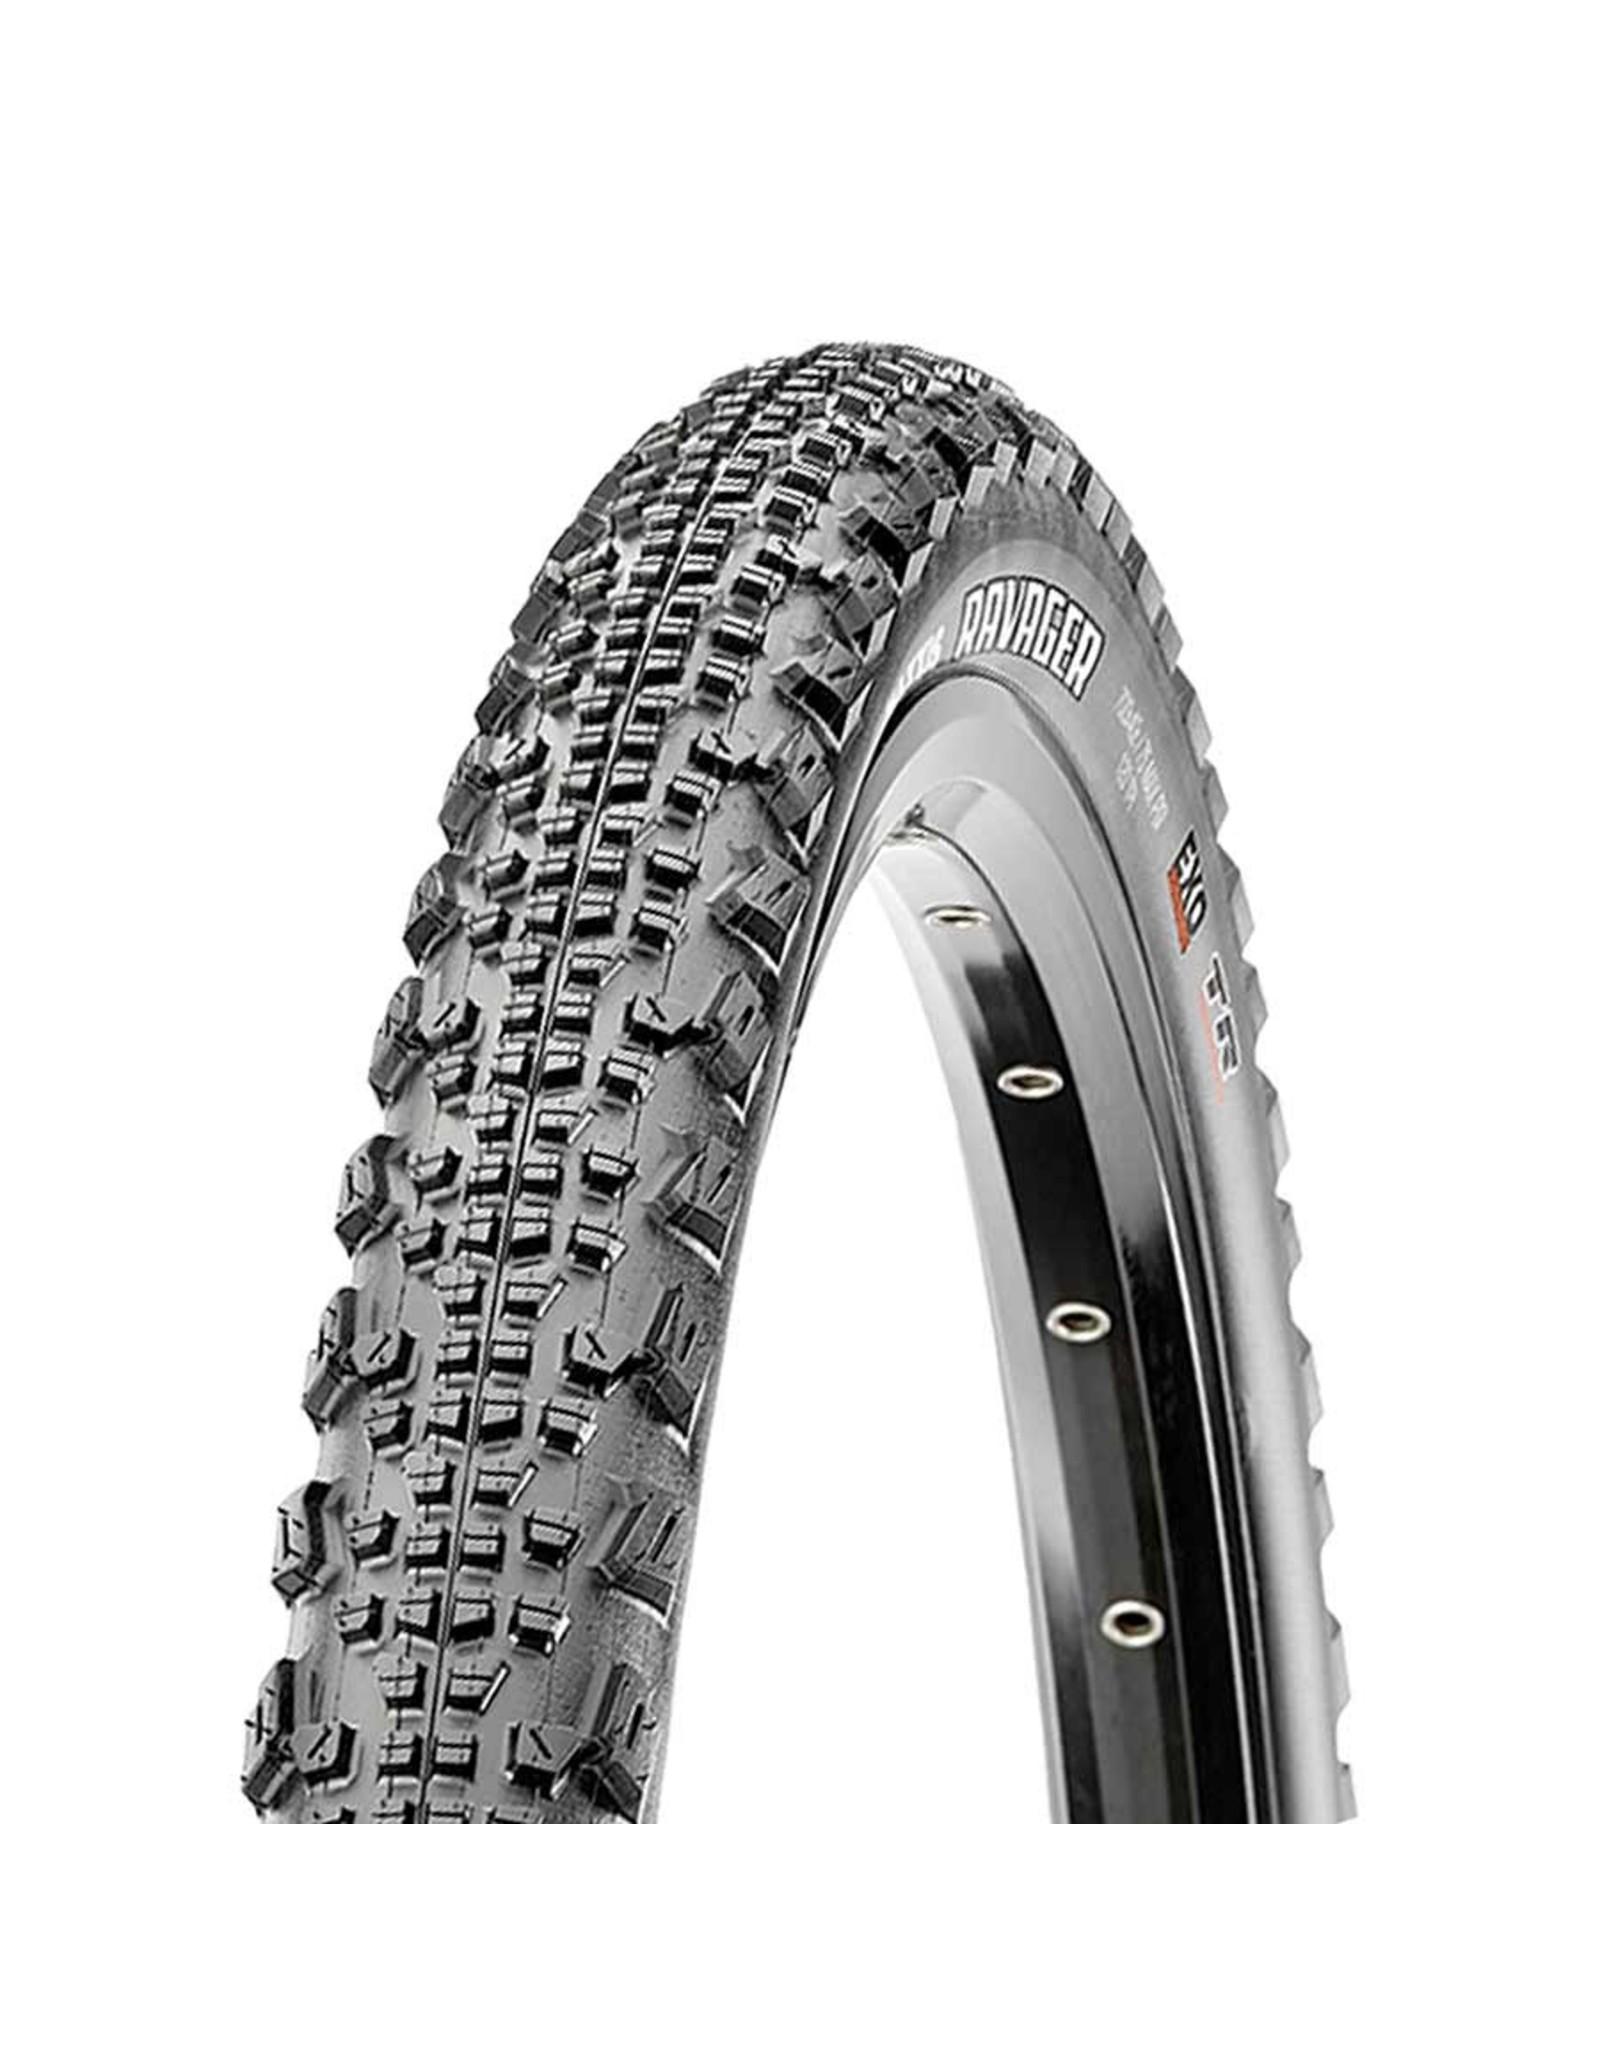 Maxxis Maxxis, Ravager, Tire, 700x40C, Folding, Tubeless Ready, Dual, EXO, 120TPI, Black